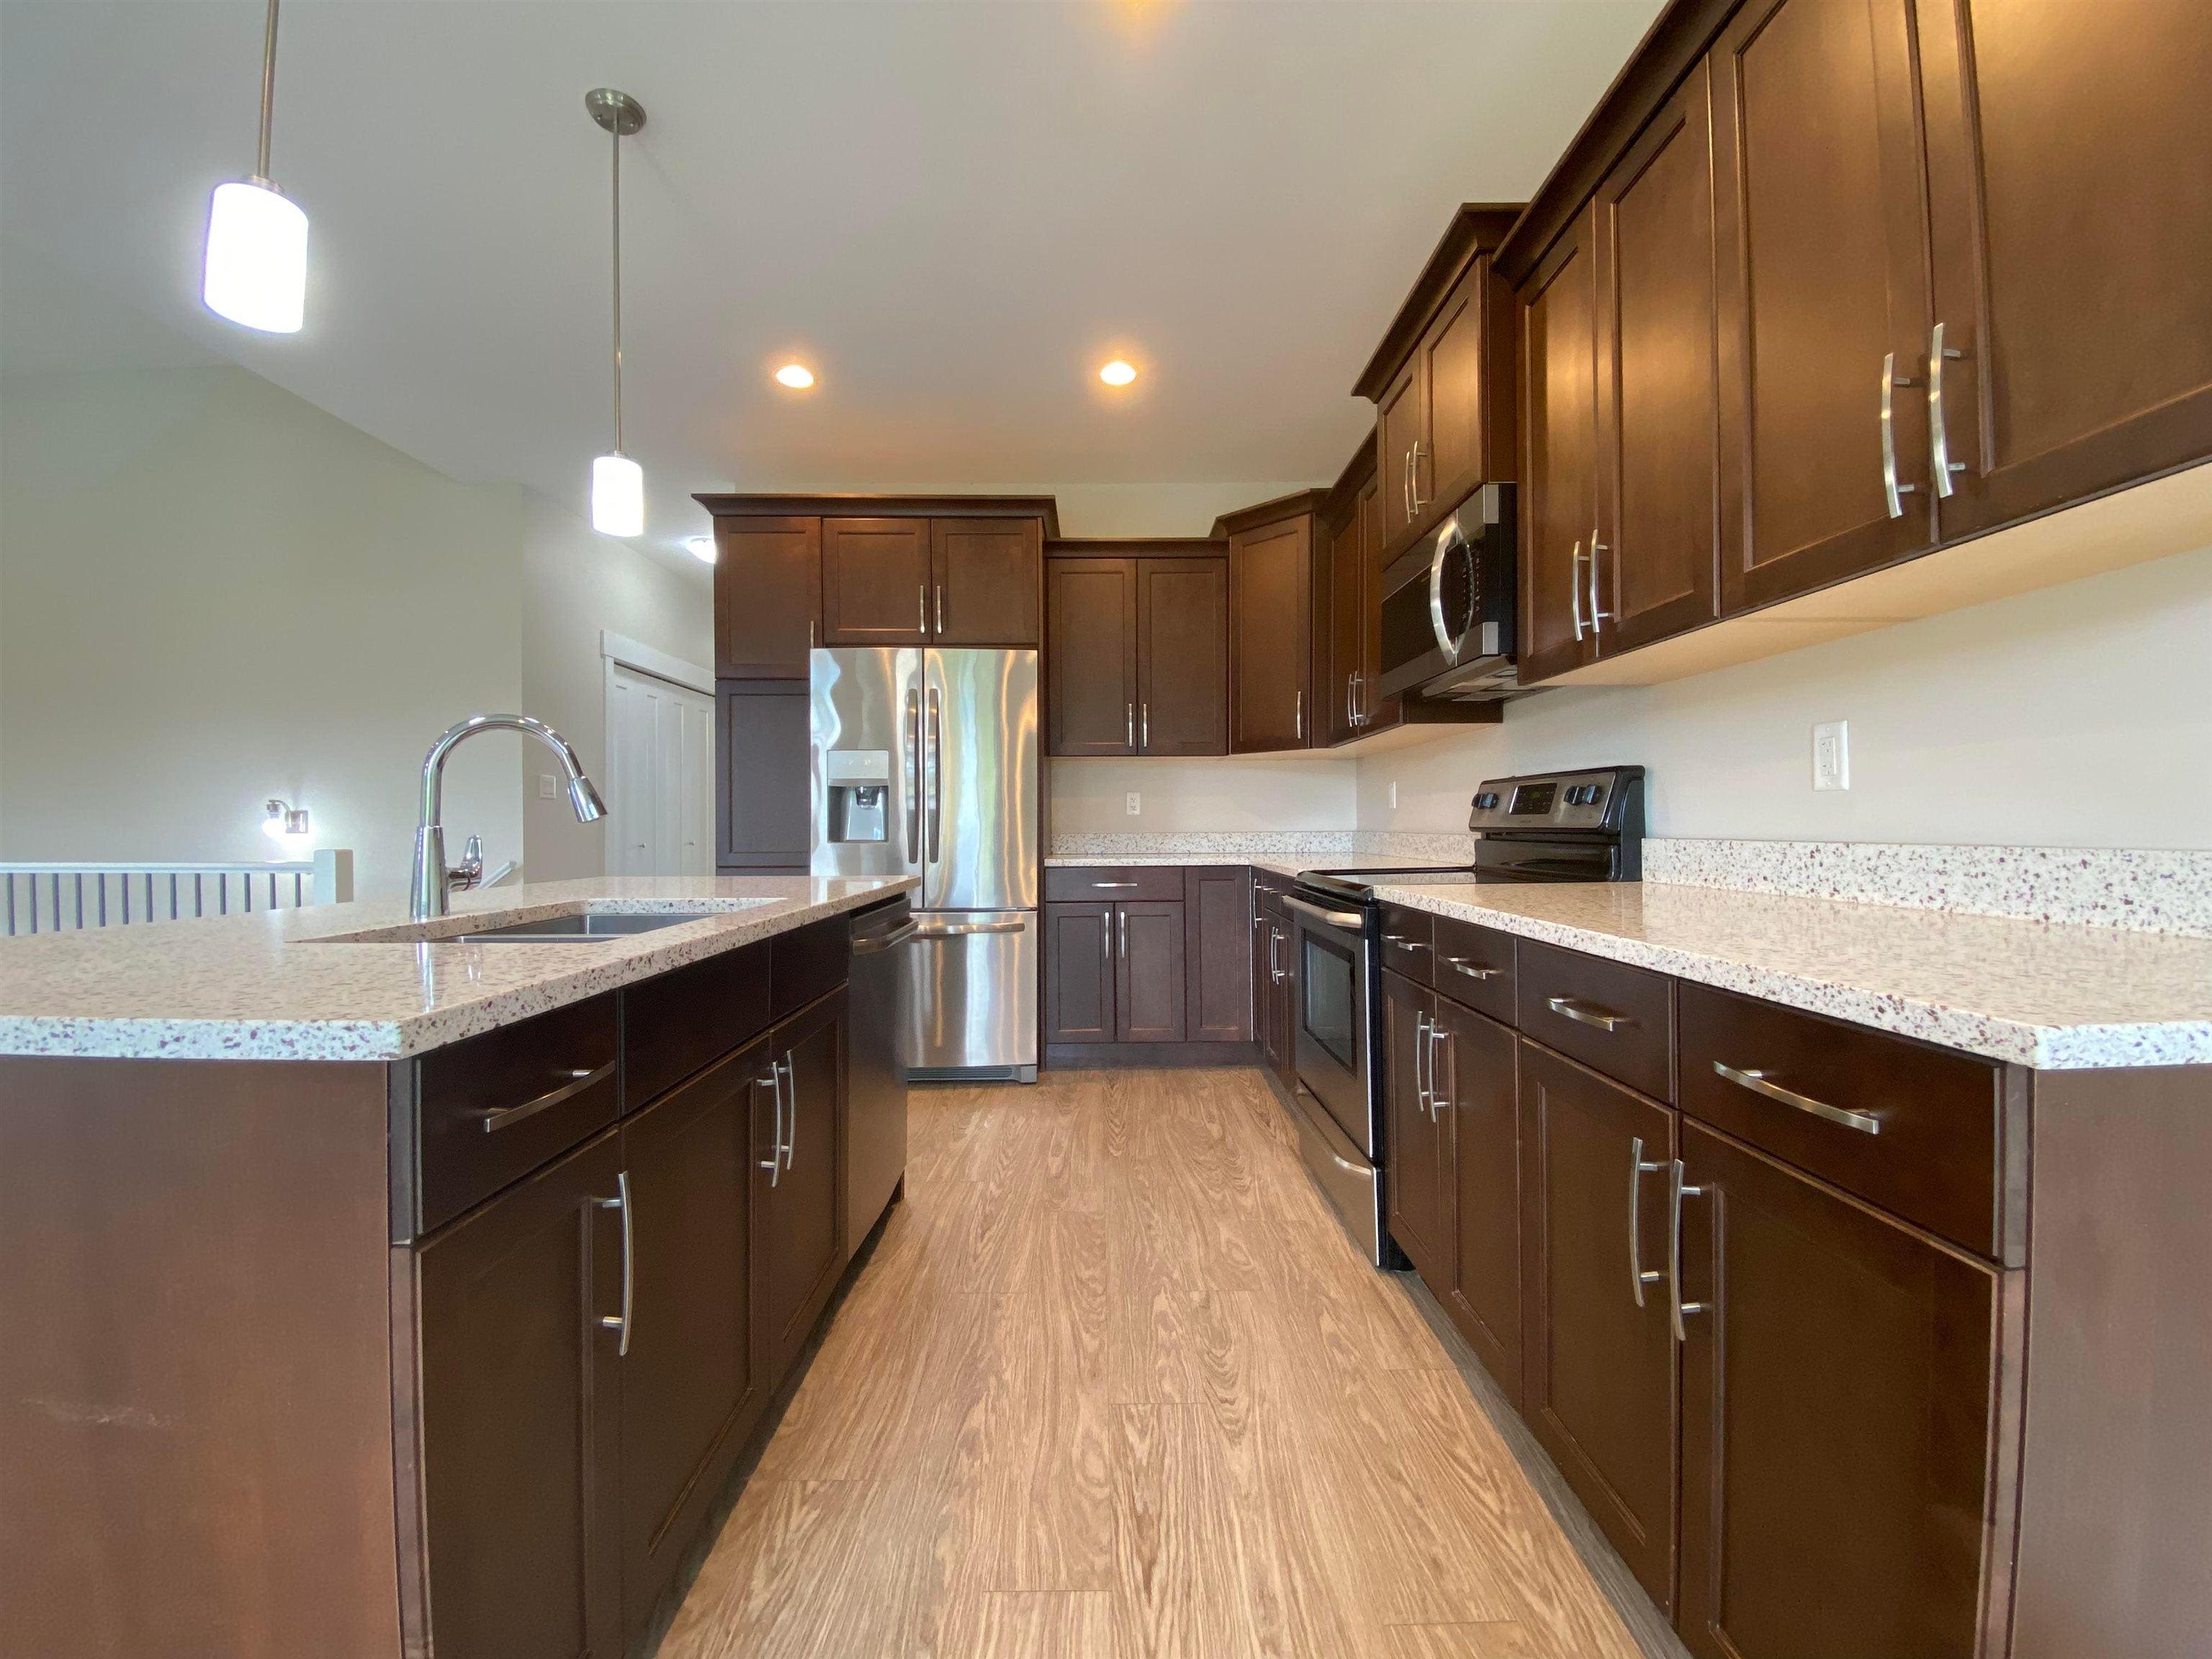 10144 KILLARNEY DRIVE - Fairfield Island House/Single Family for sale, 5 Bedrooms (R2625716) - #14